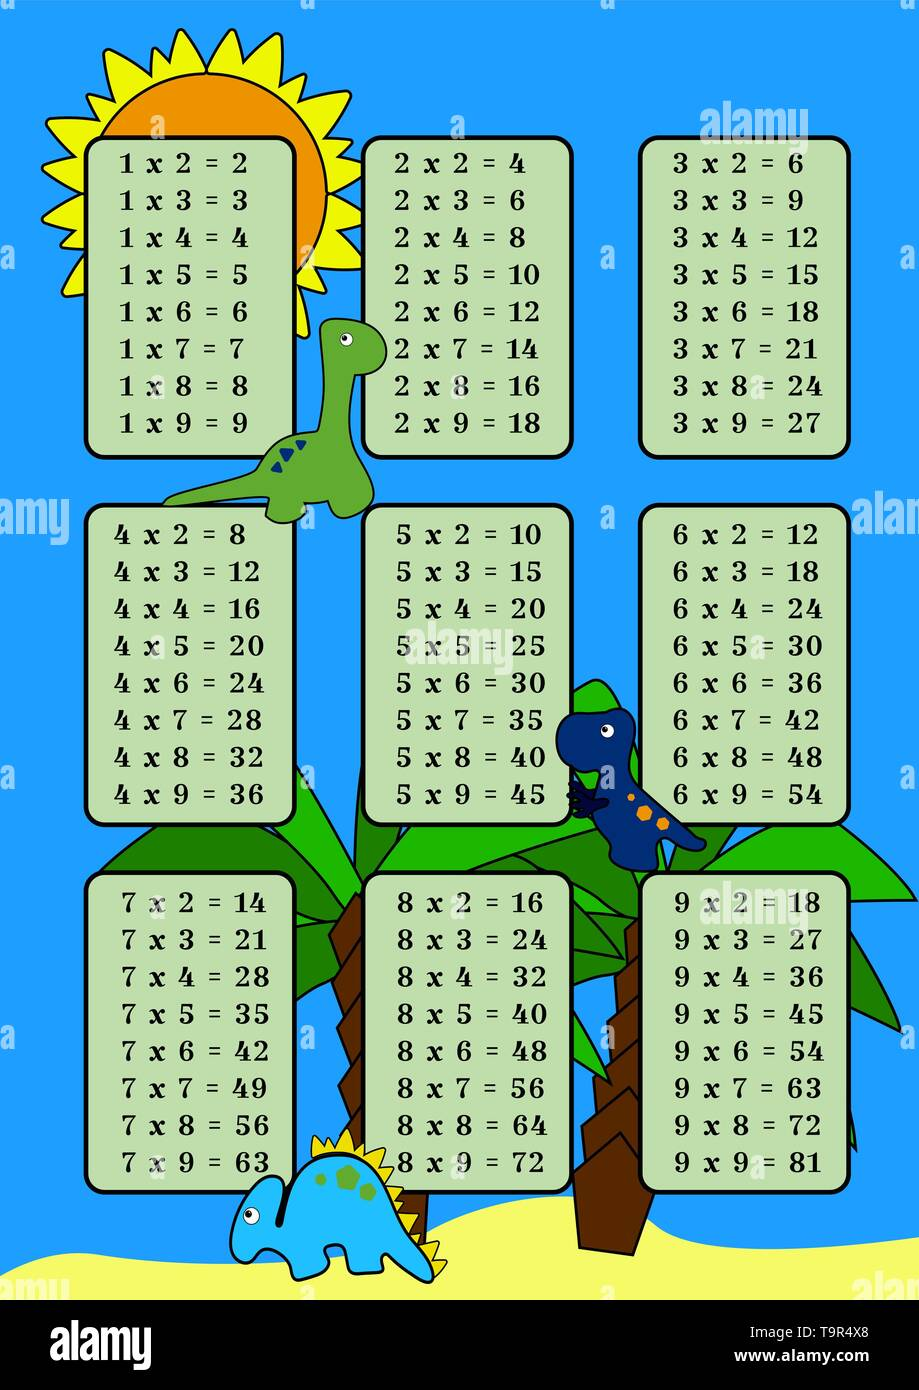 Multiplication Table Stock Photos & Multiplication Table